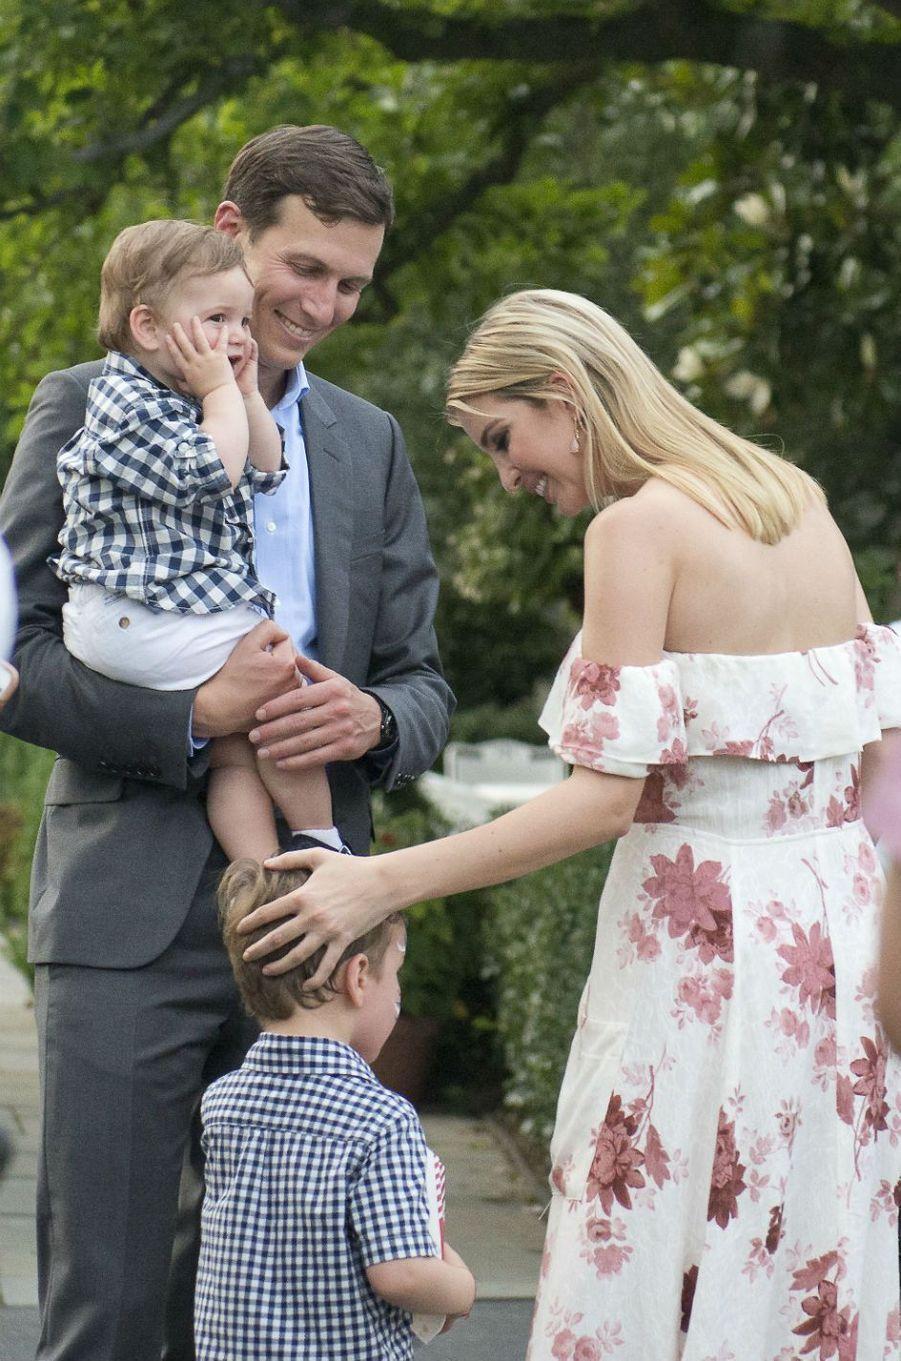 Jared Kushner,Ivanka Trump et leurs enfants à la Maison Blanche, en juin 2017.